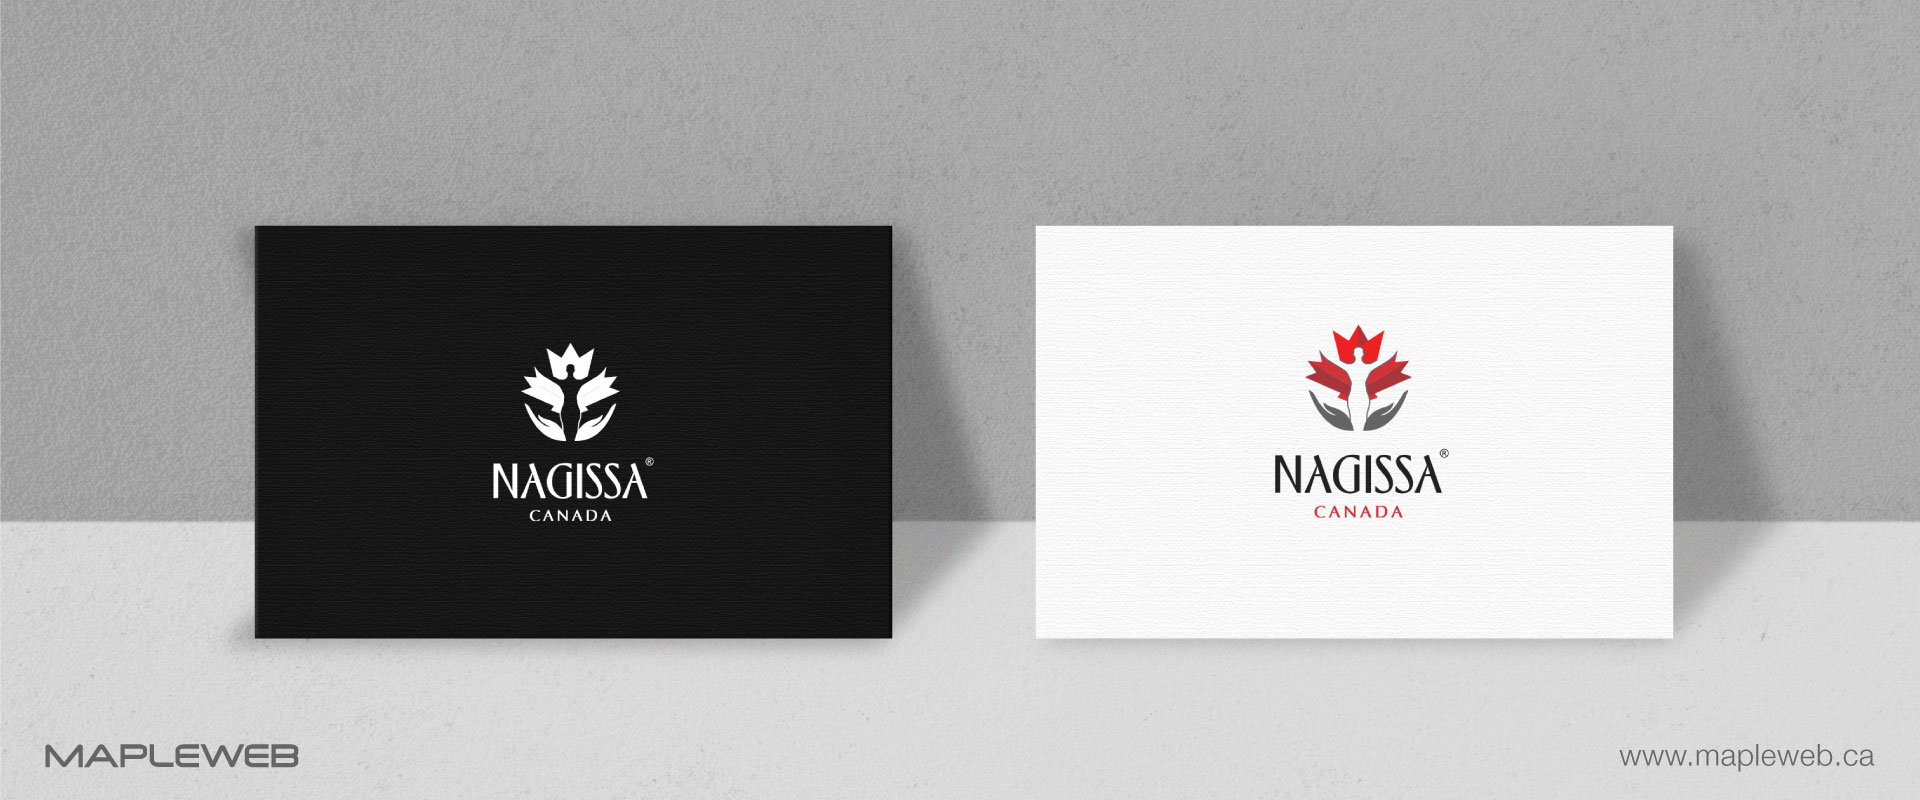 nagissa-canada-brand-logo-design-by-mapleweb-vancouver-canada-logo-on-business-card-mock